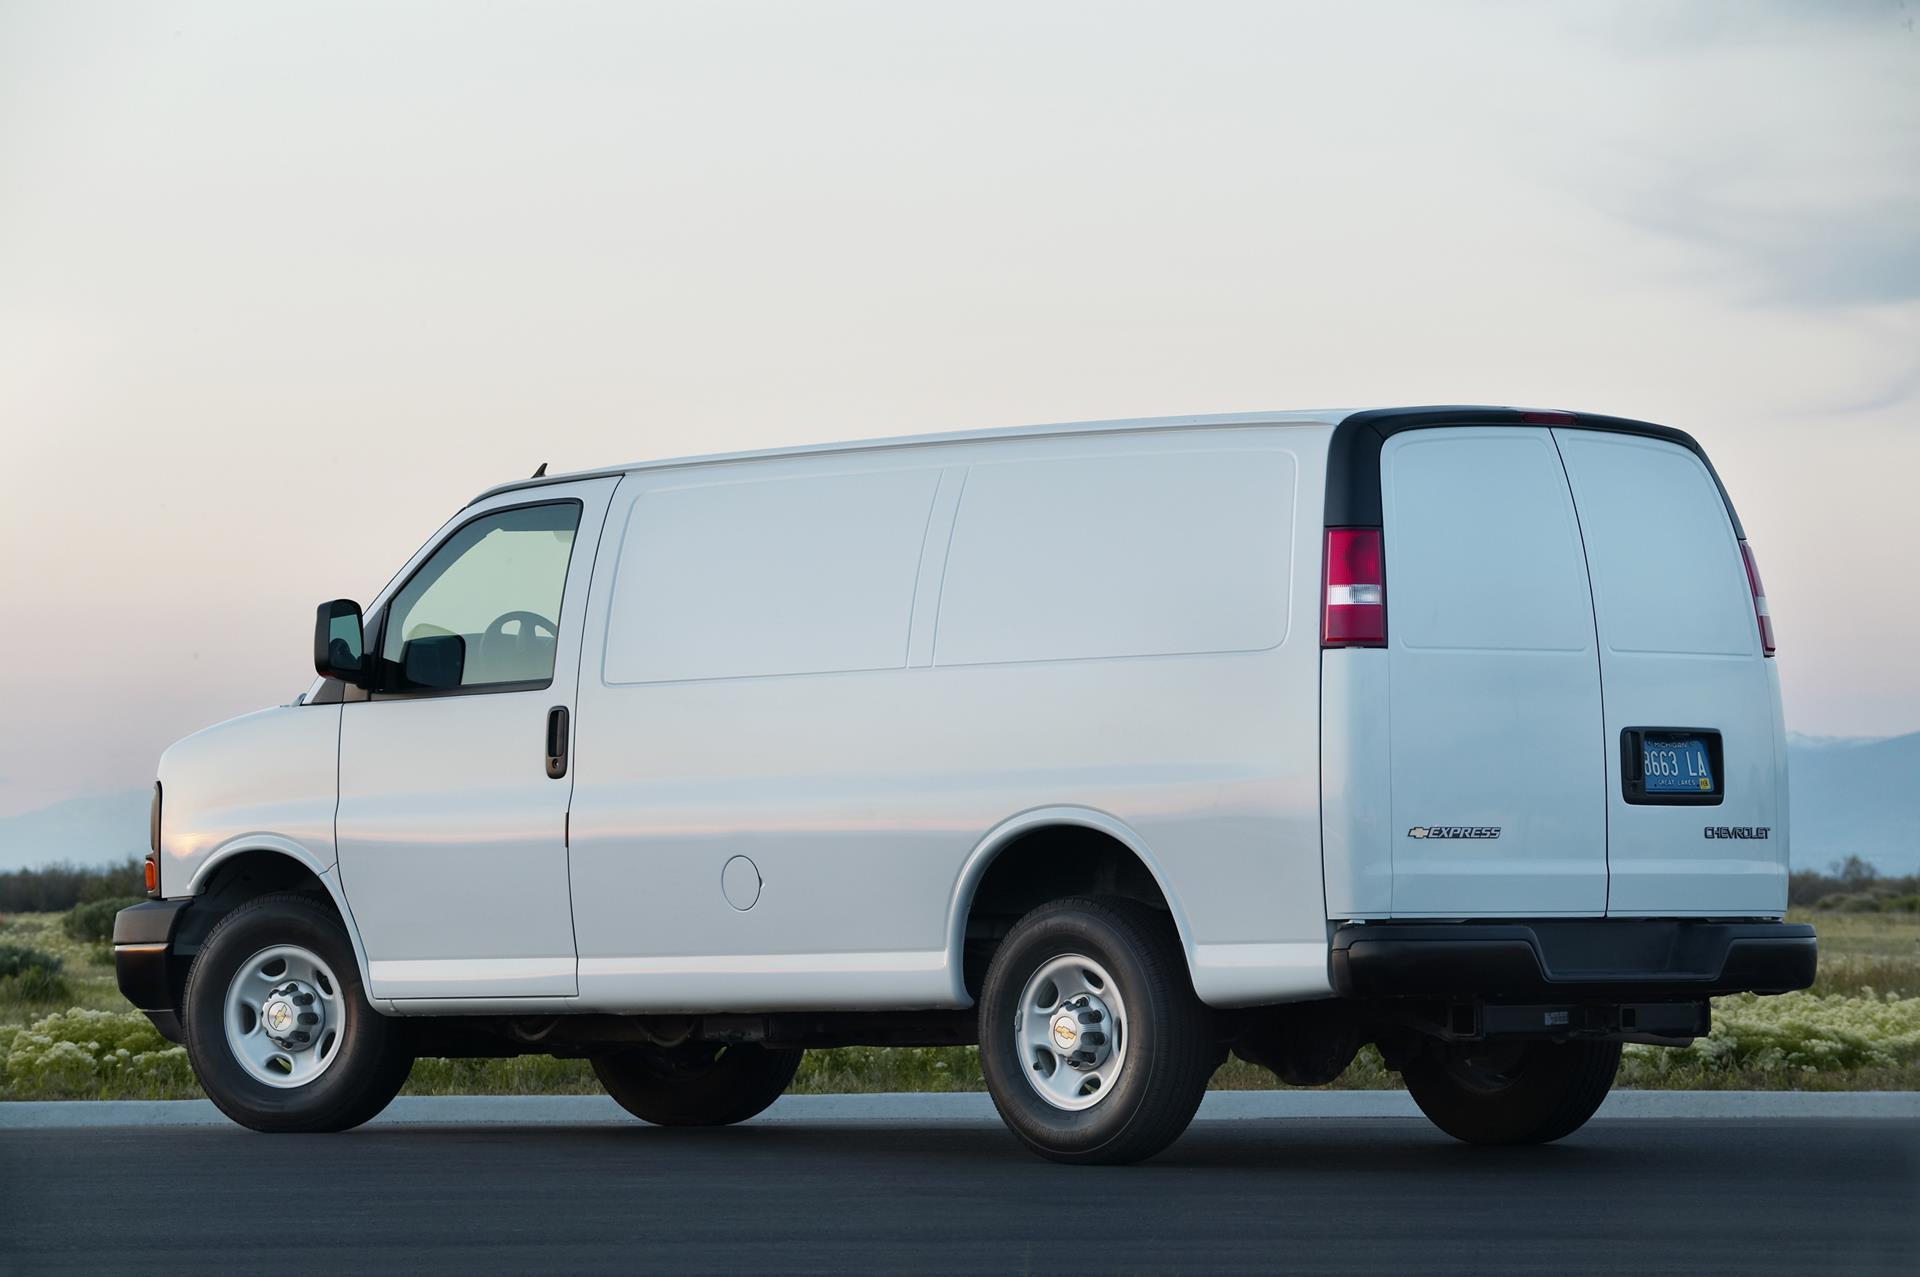 2016 Chevy Express Passenger Van - Release Date, Interior Changes ...